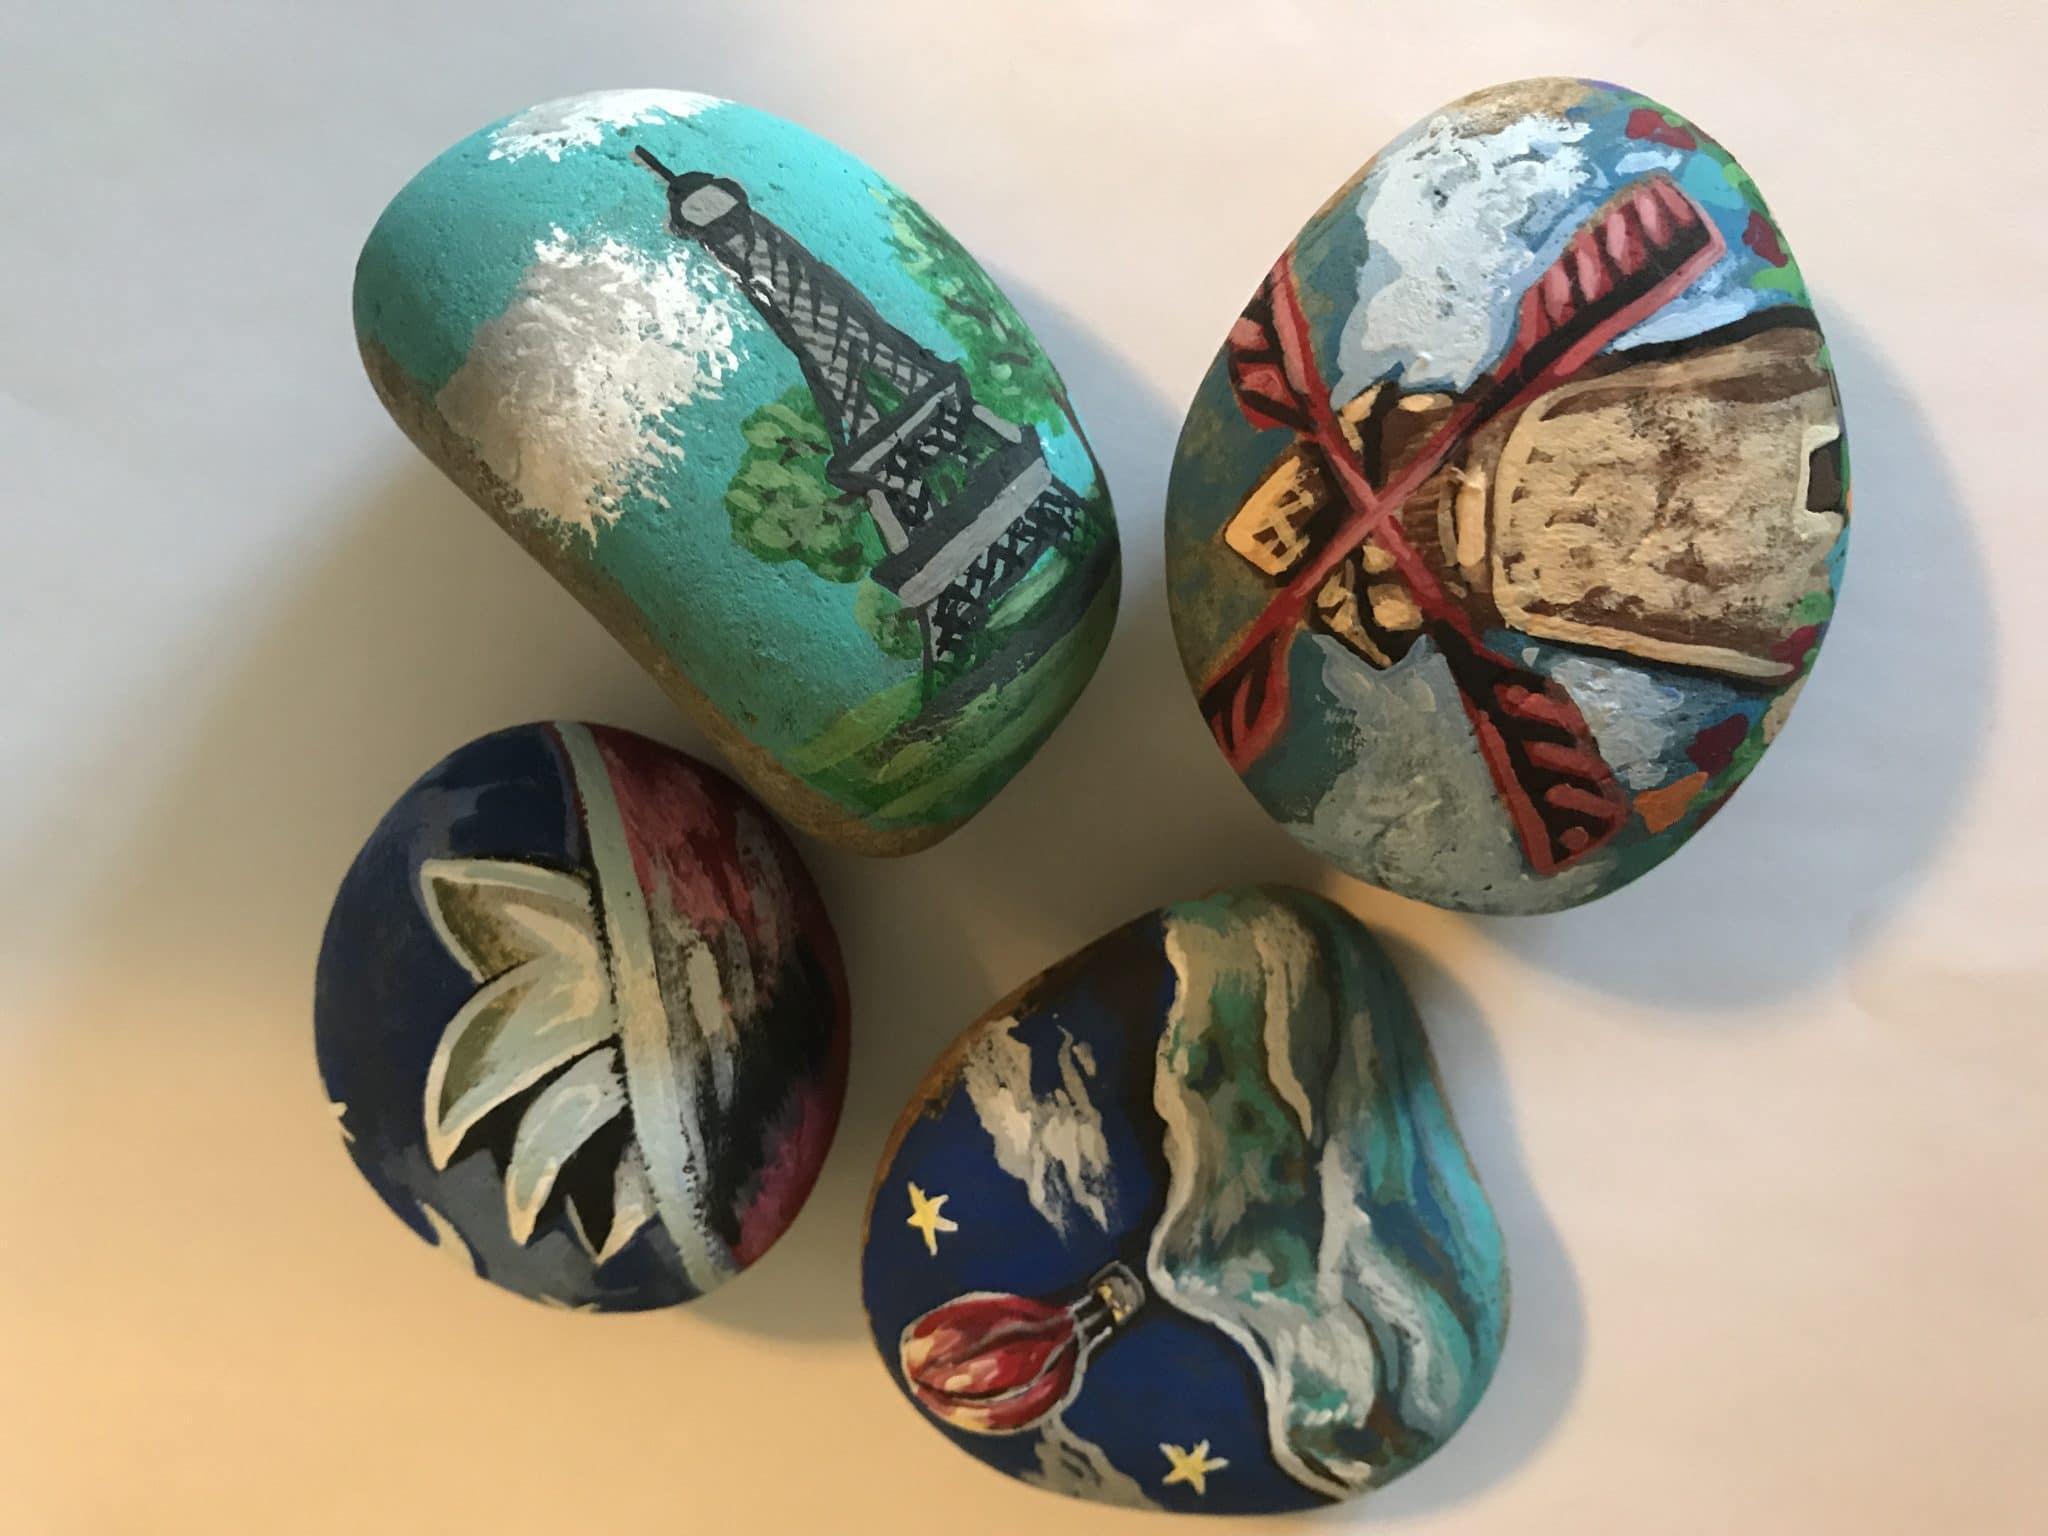 Travelnitch Rocks